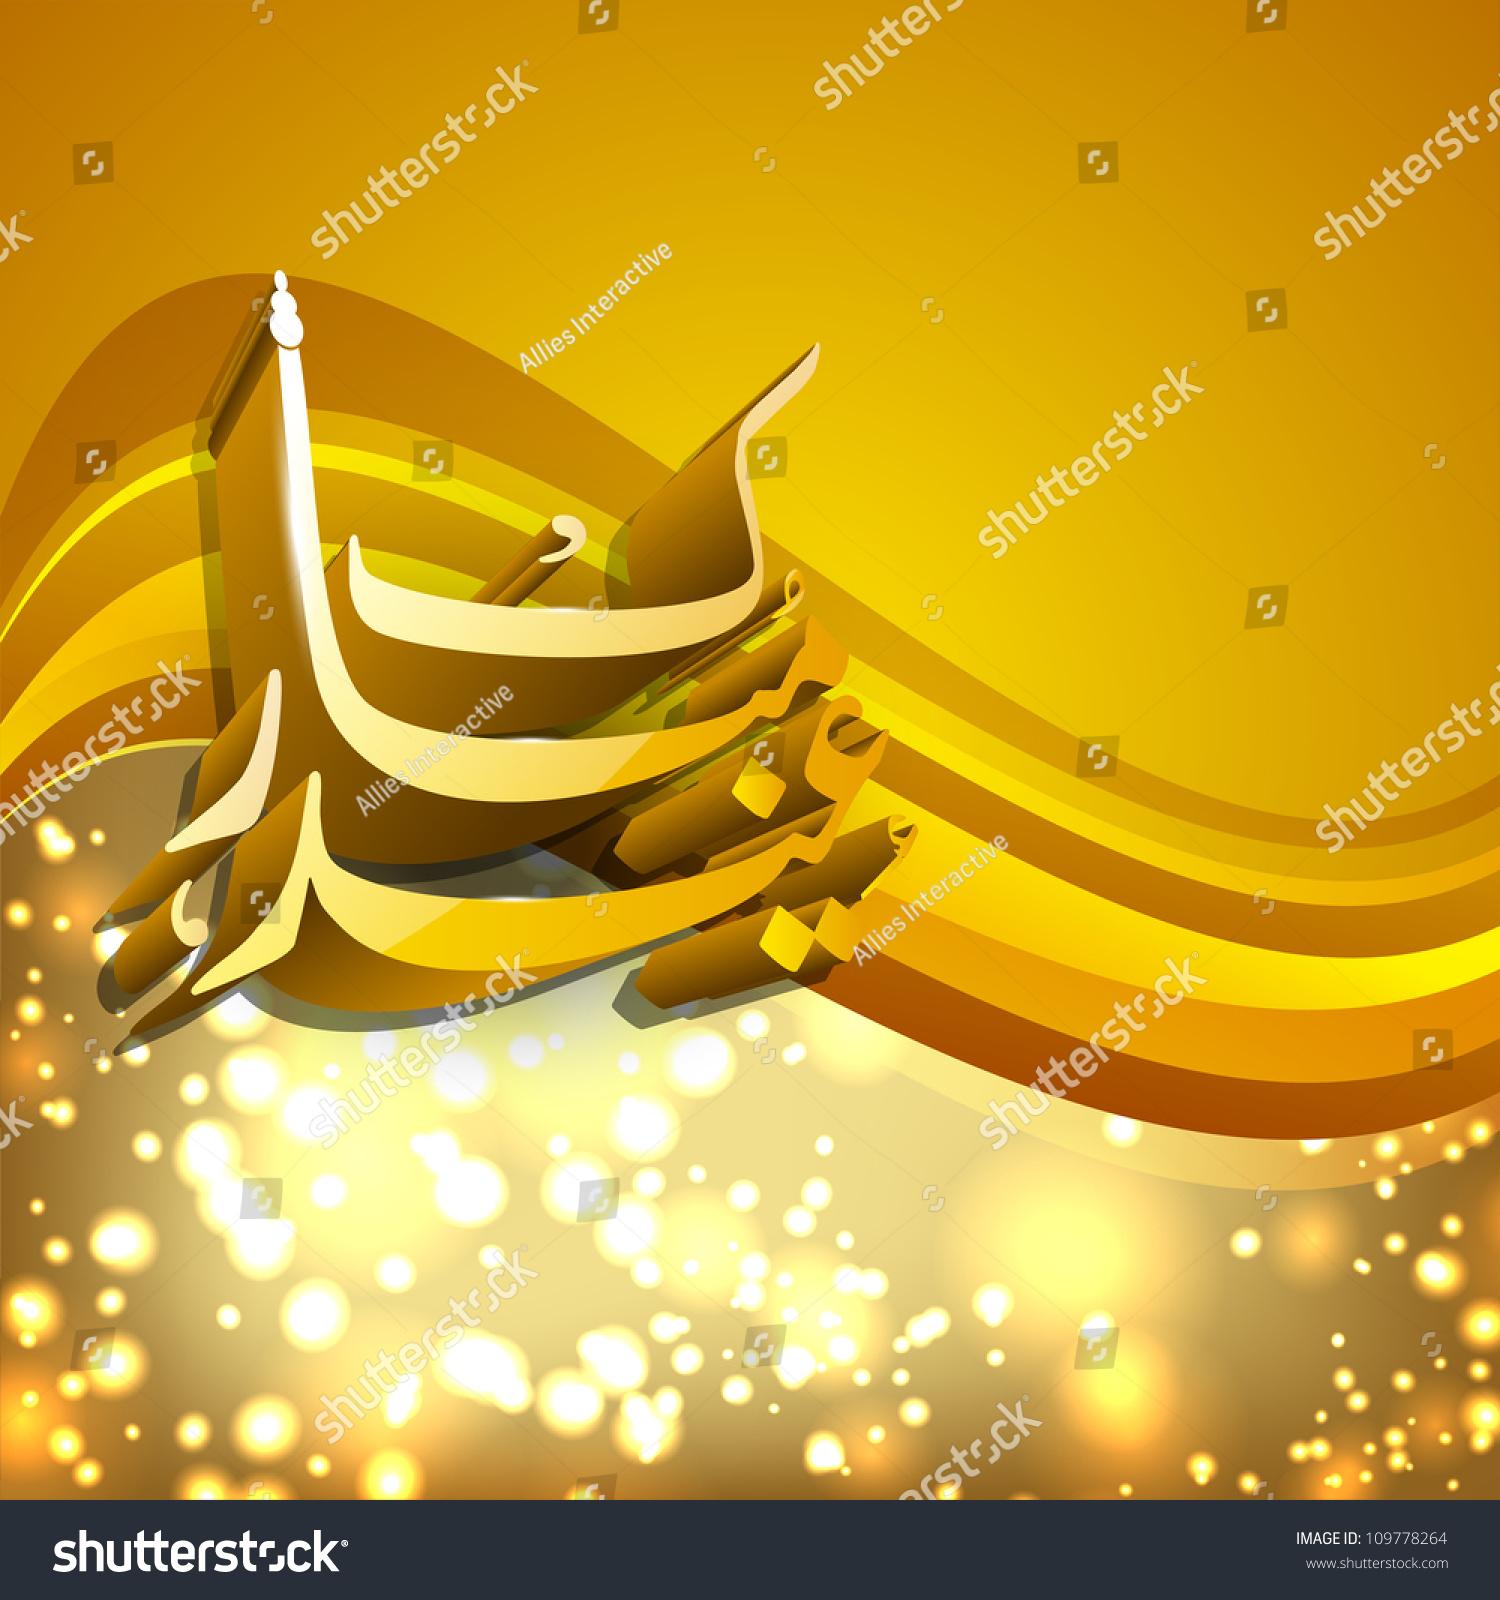 3d Arabic Islamic Calligraphy Golden Text Stock Vector